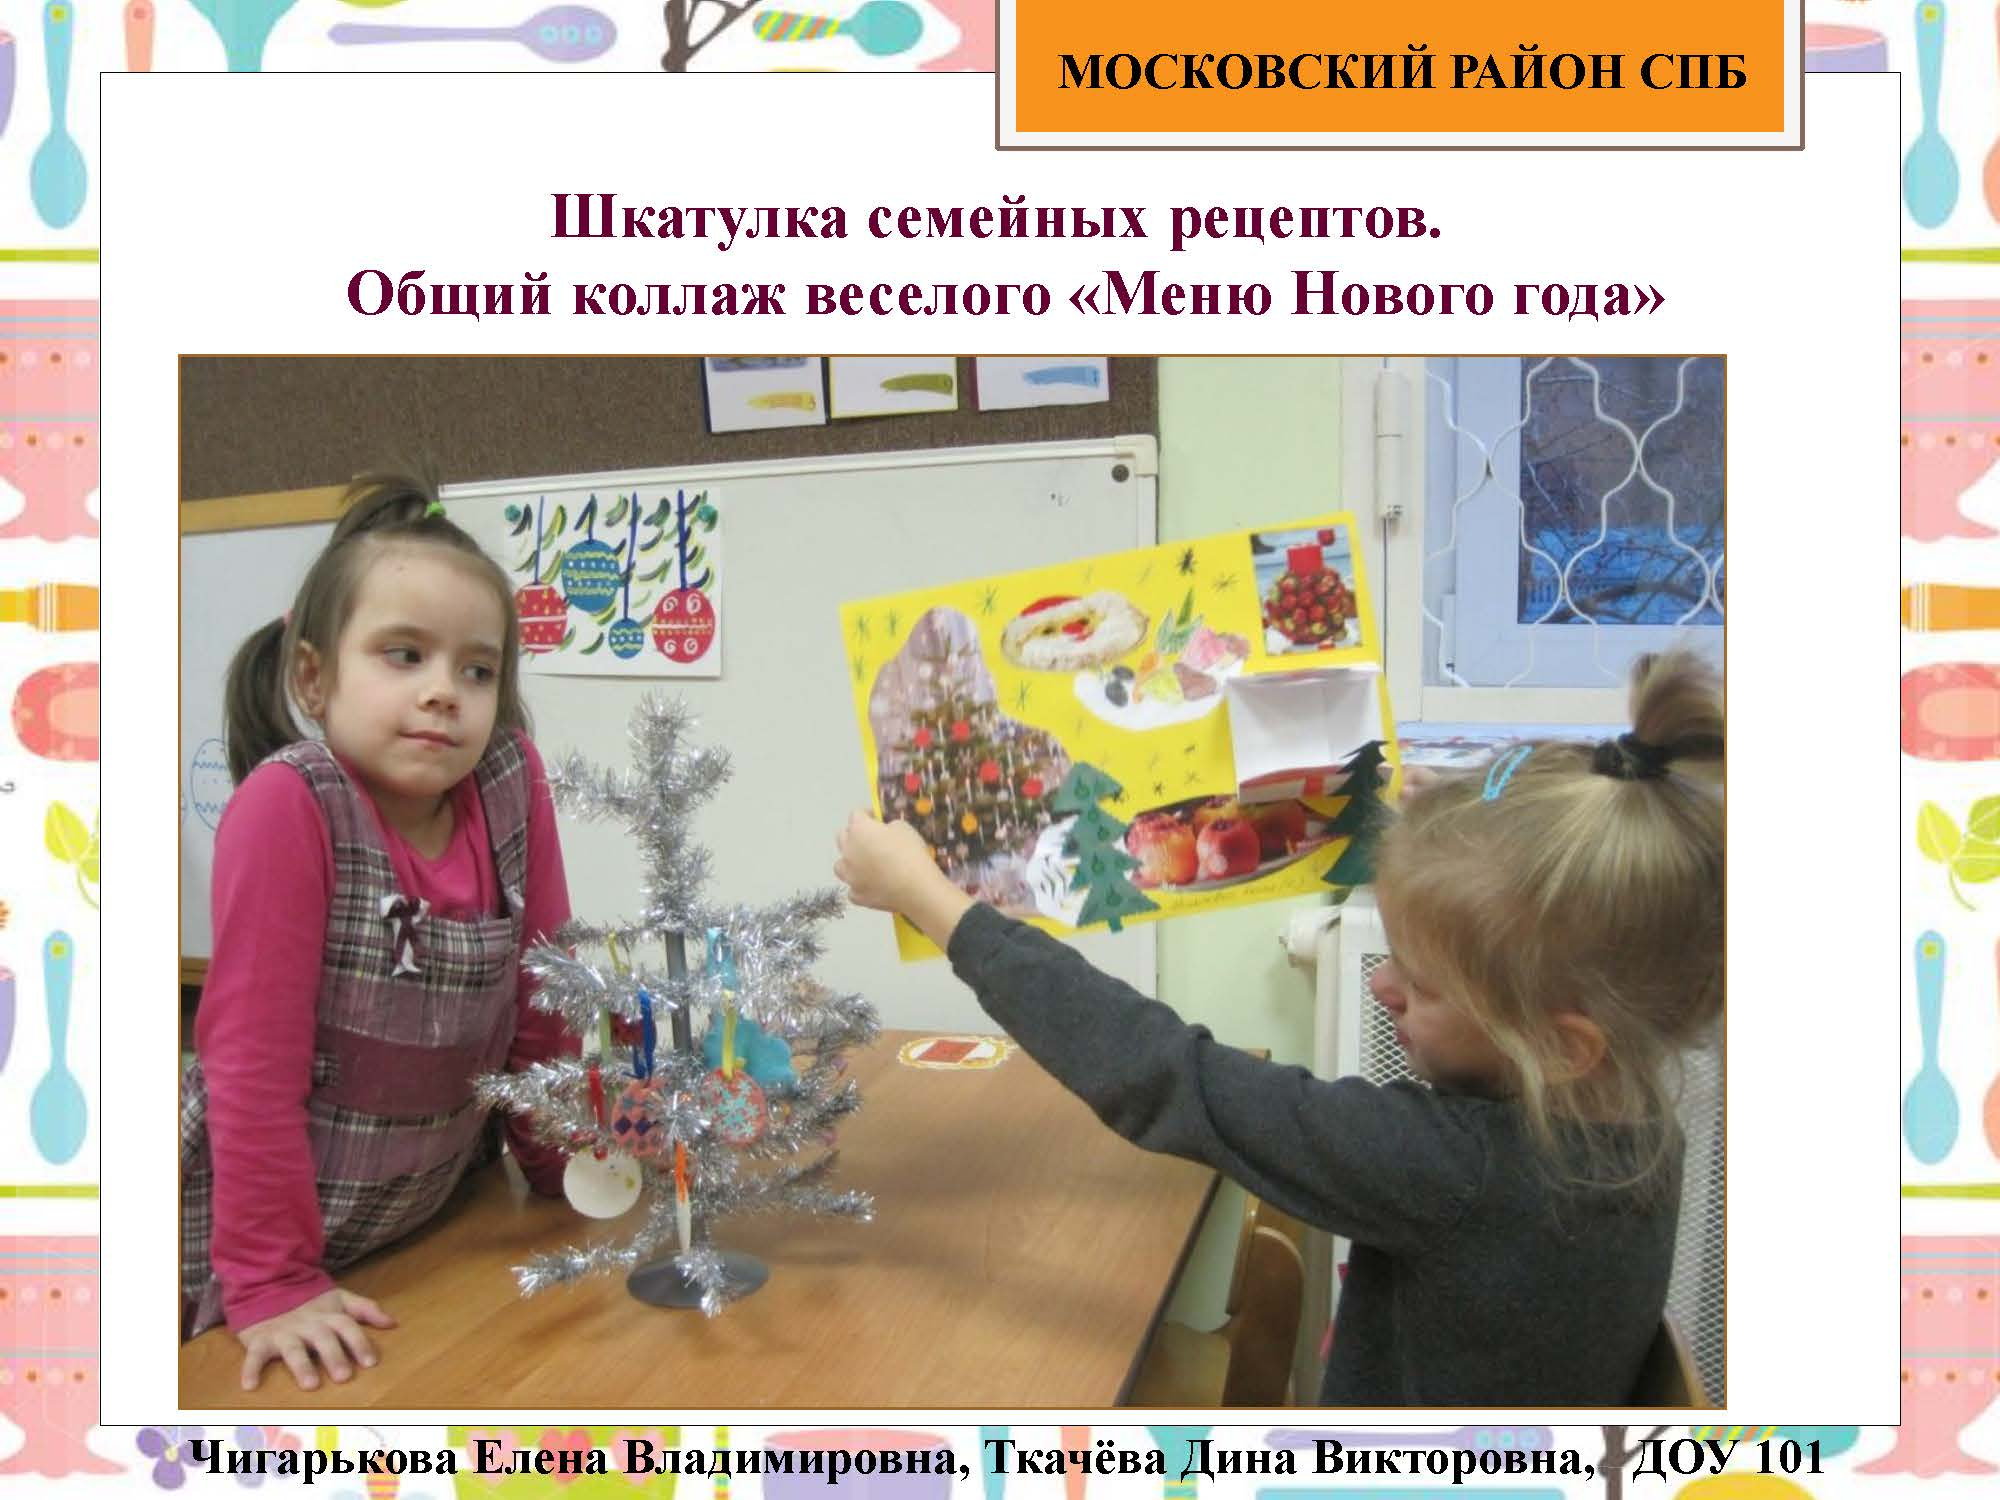 Секция 8. ДОУ 101, ПСИ. Московский район_Страница_12